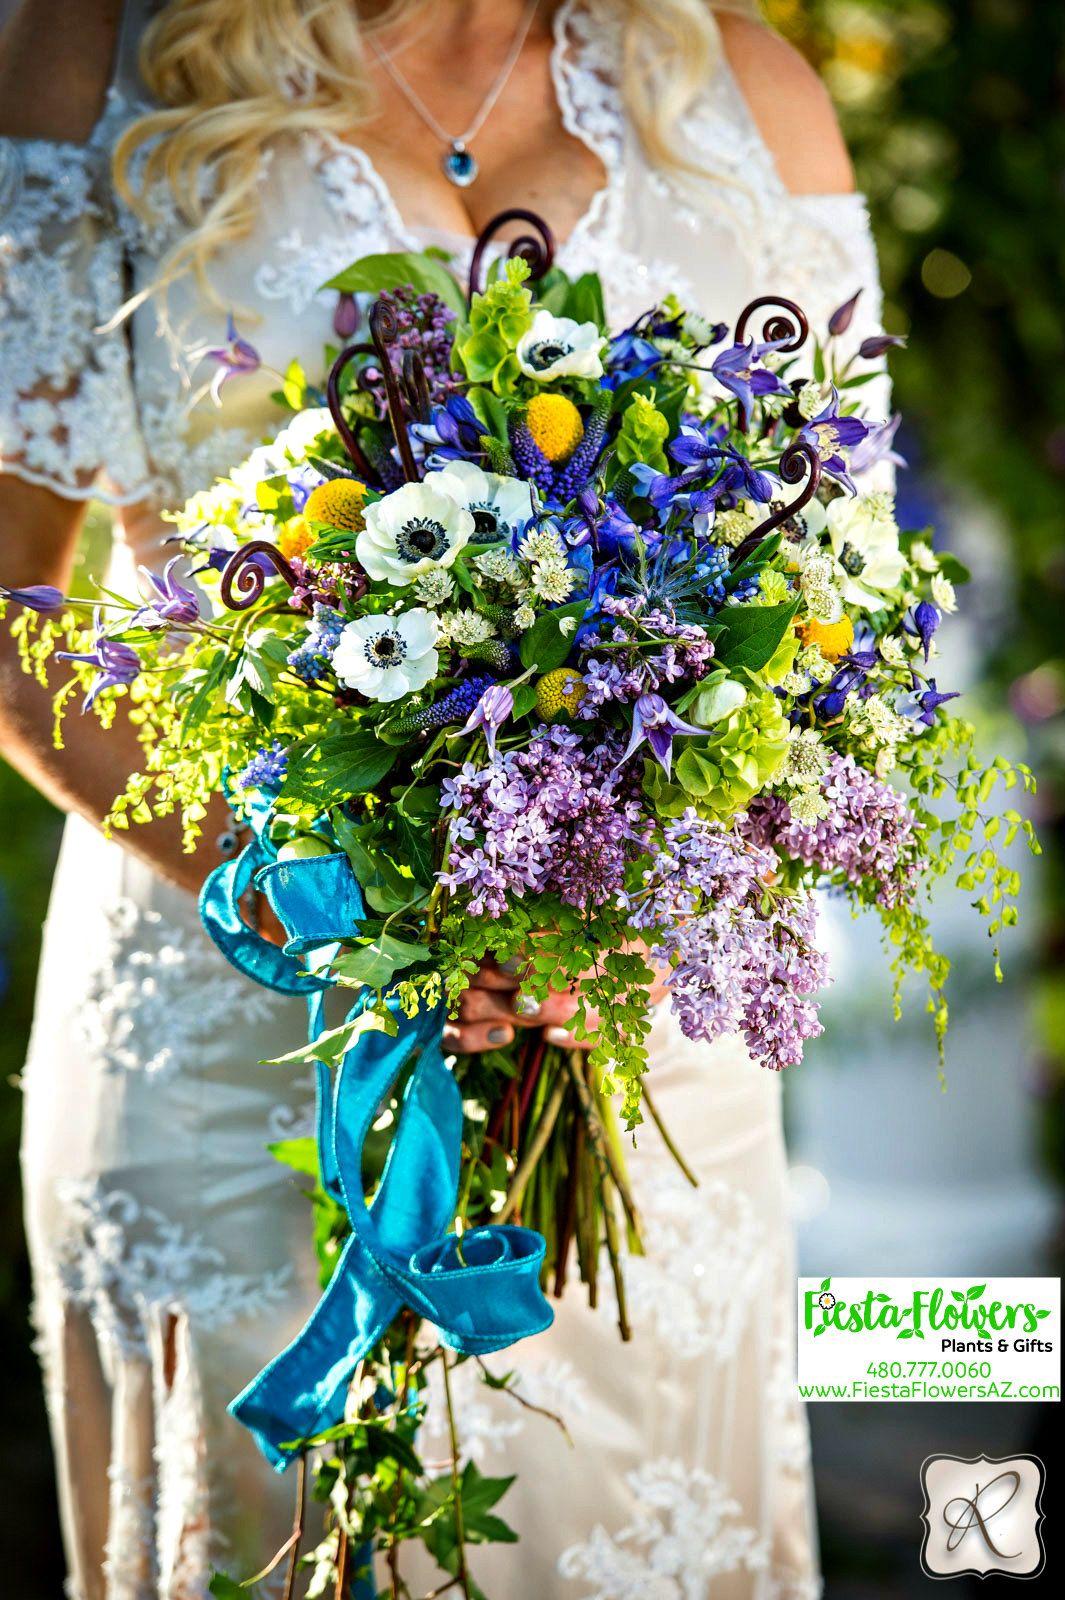 Fiesta flowers plants gifts local fullservice florist